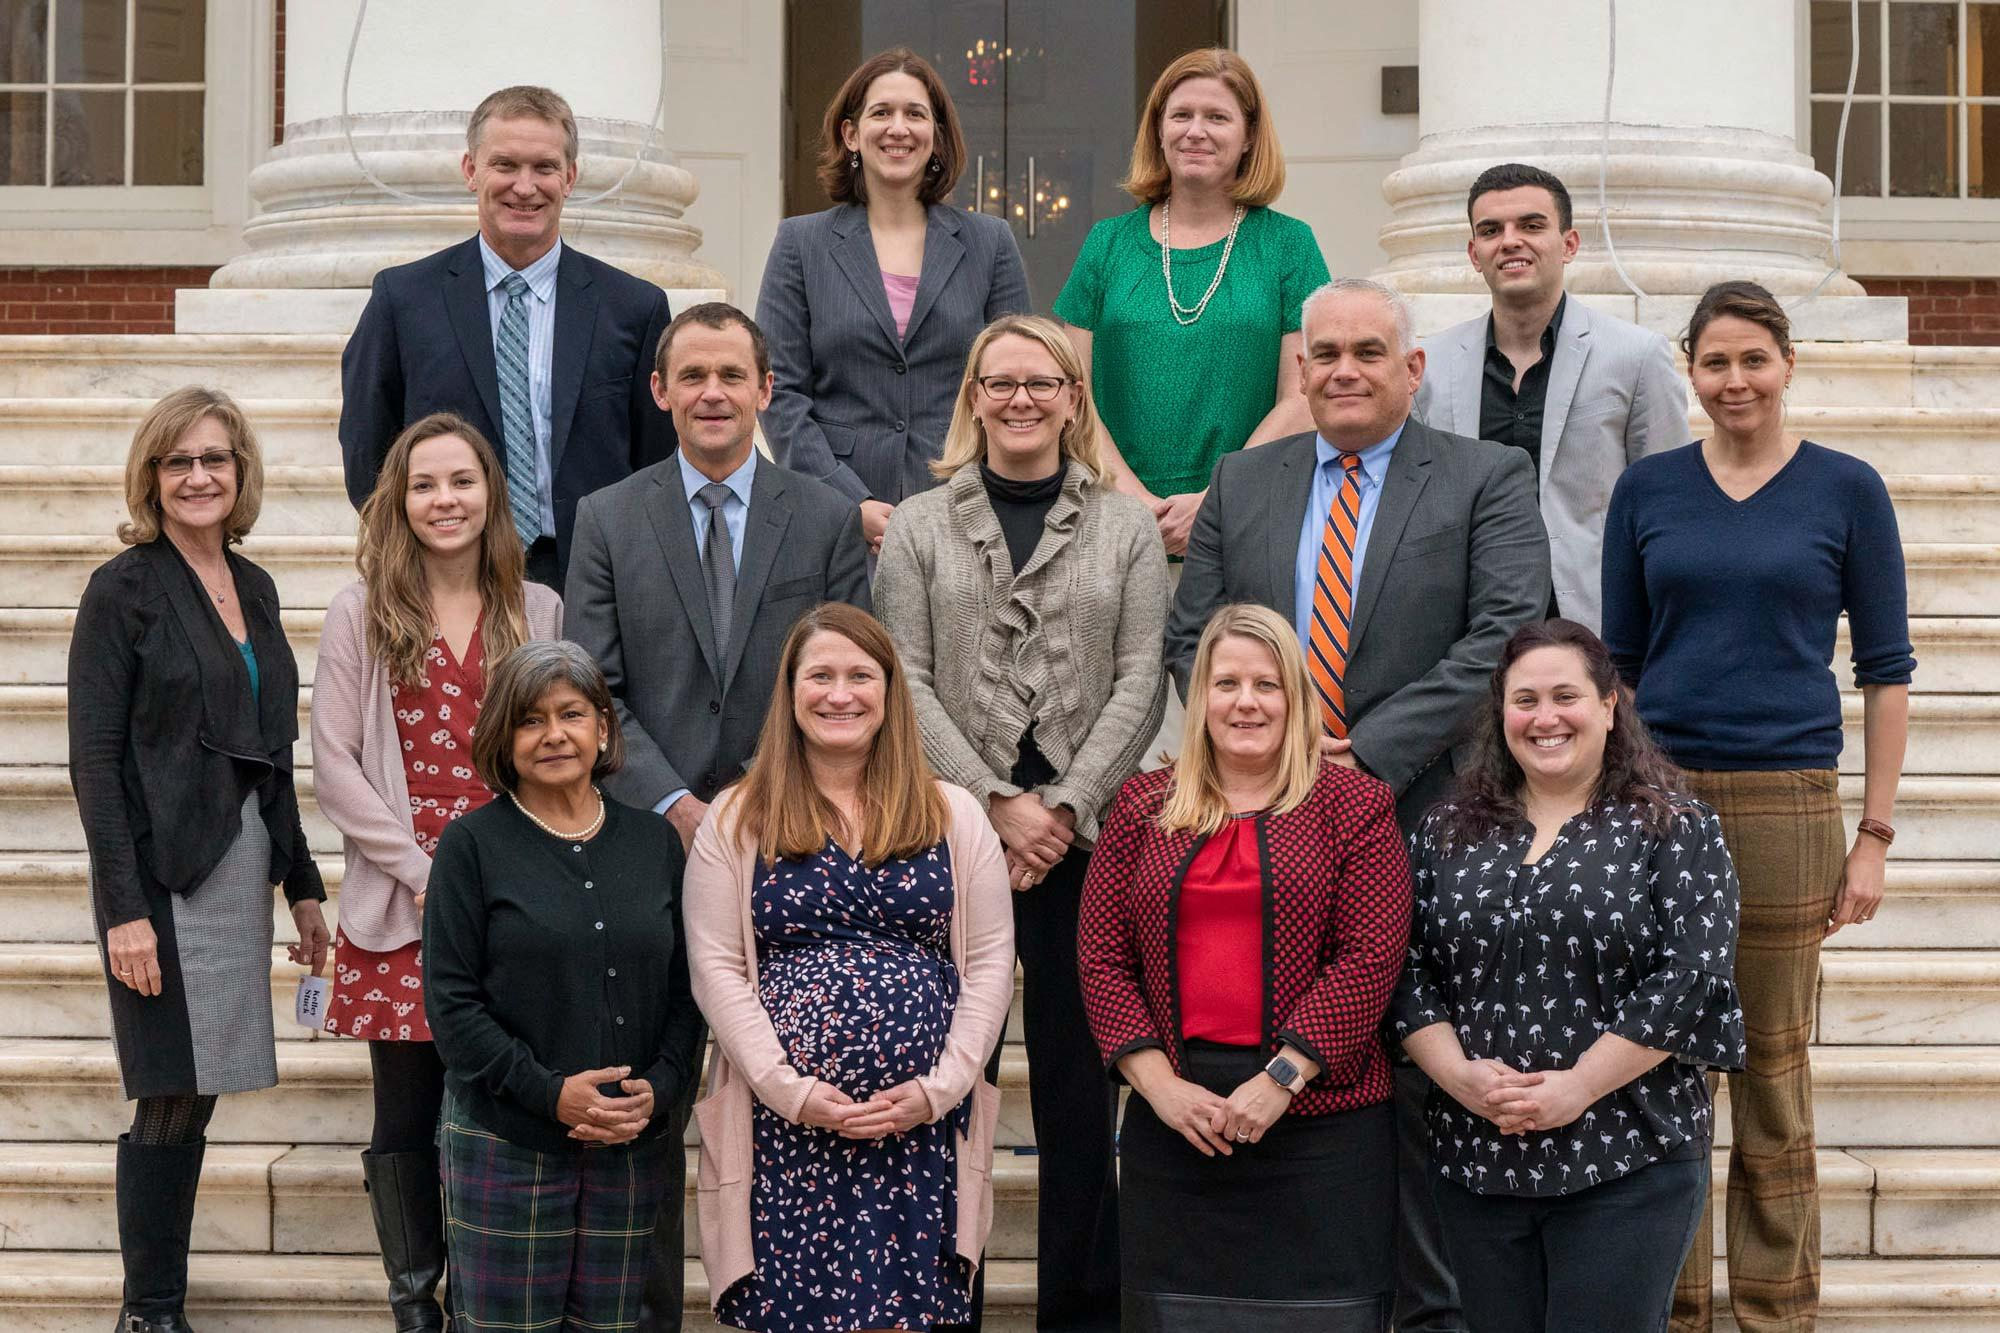 The 2019 Hoos Building Bridges Award winners with UVA President Jim Ryan before Monday's reception.